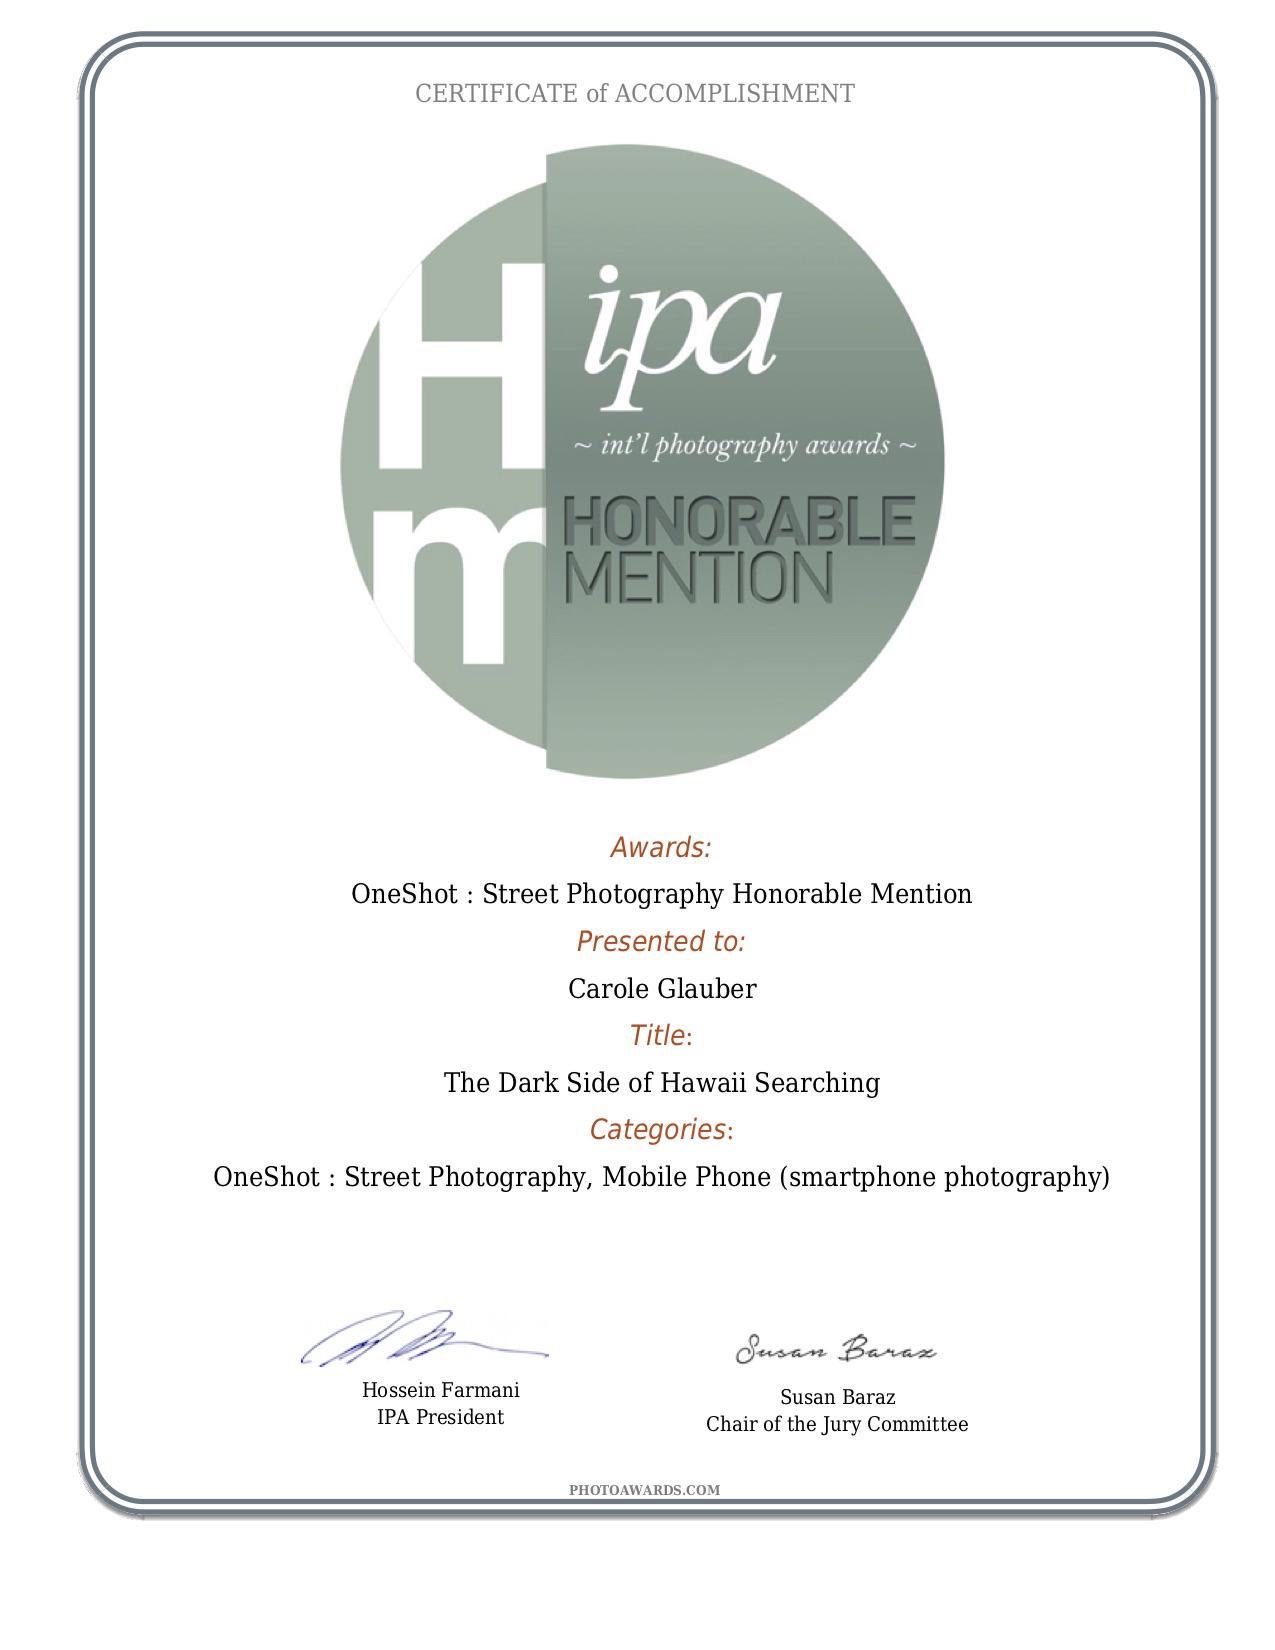 IPA certificate.jpg